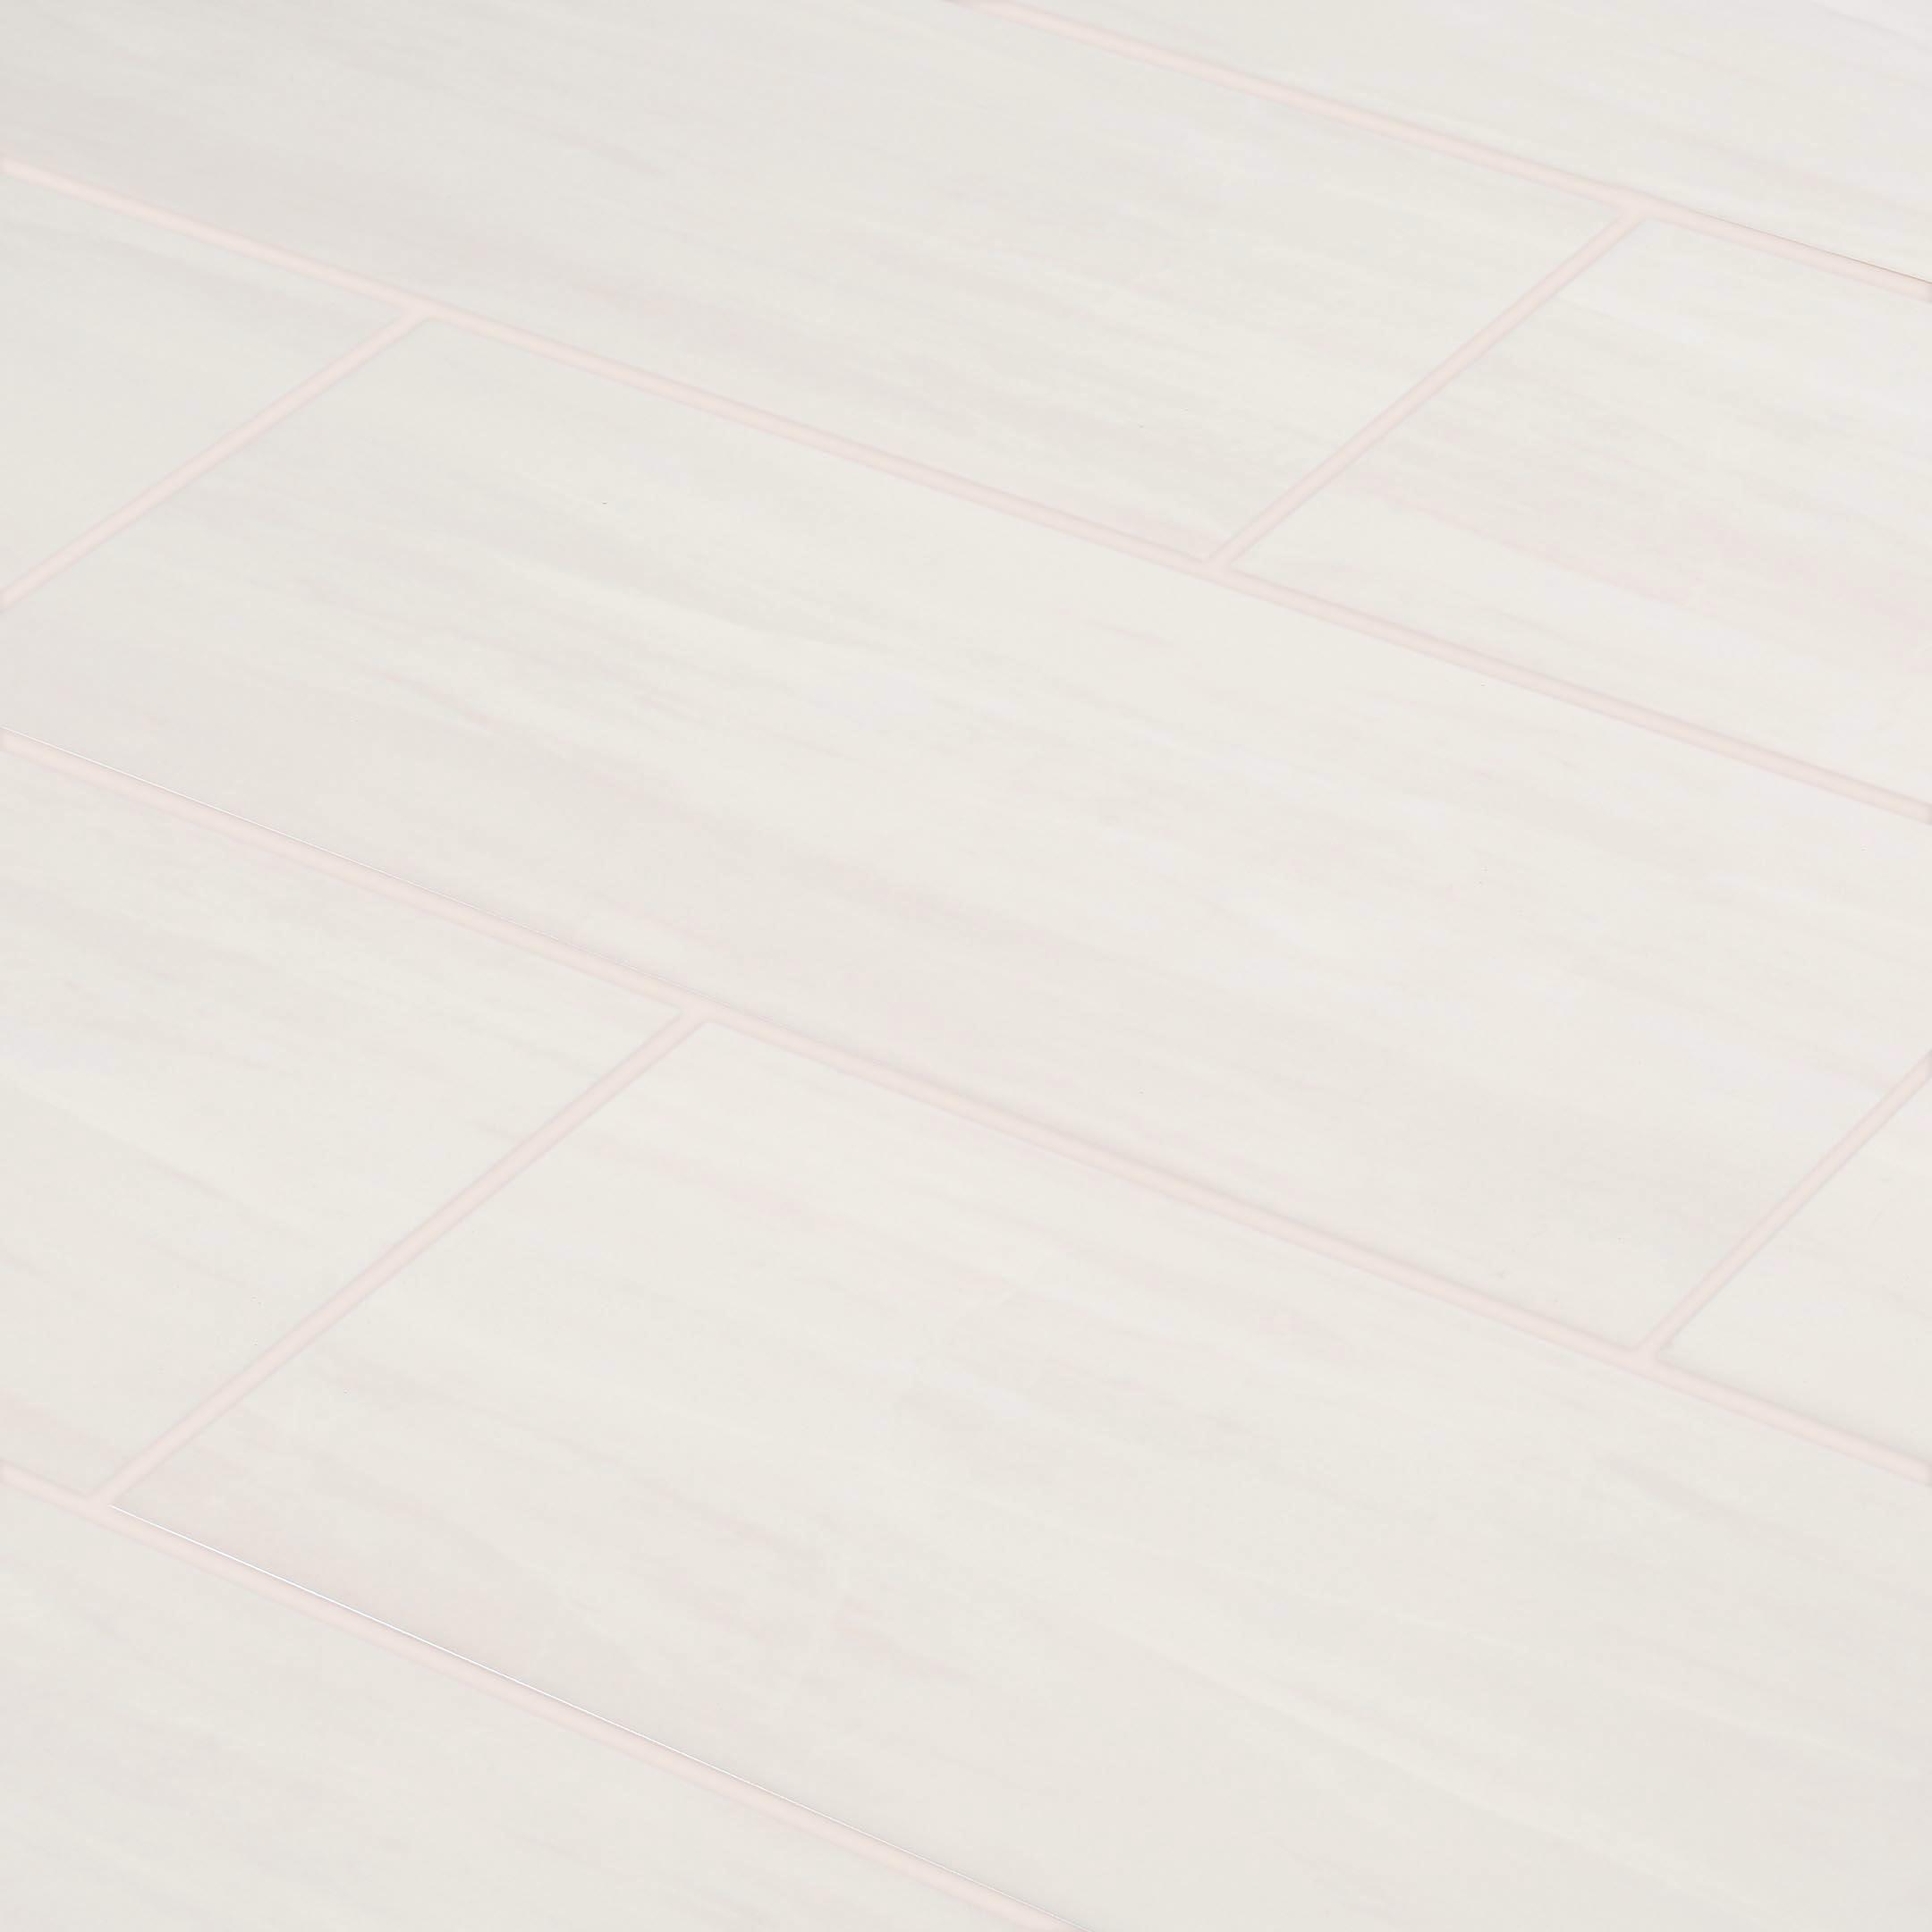 Плитка облицовочная Cersanit Atria бежевая 200x440x8,5 мм (12 шт.=1,05 кв.м)